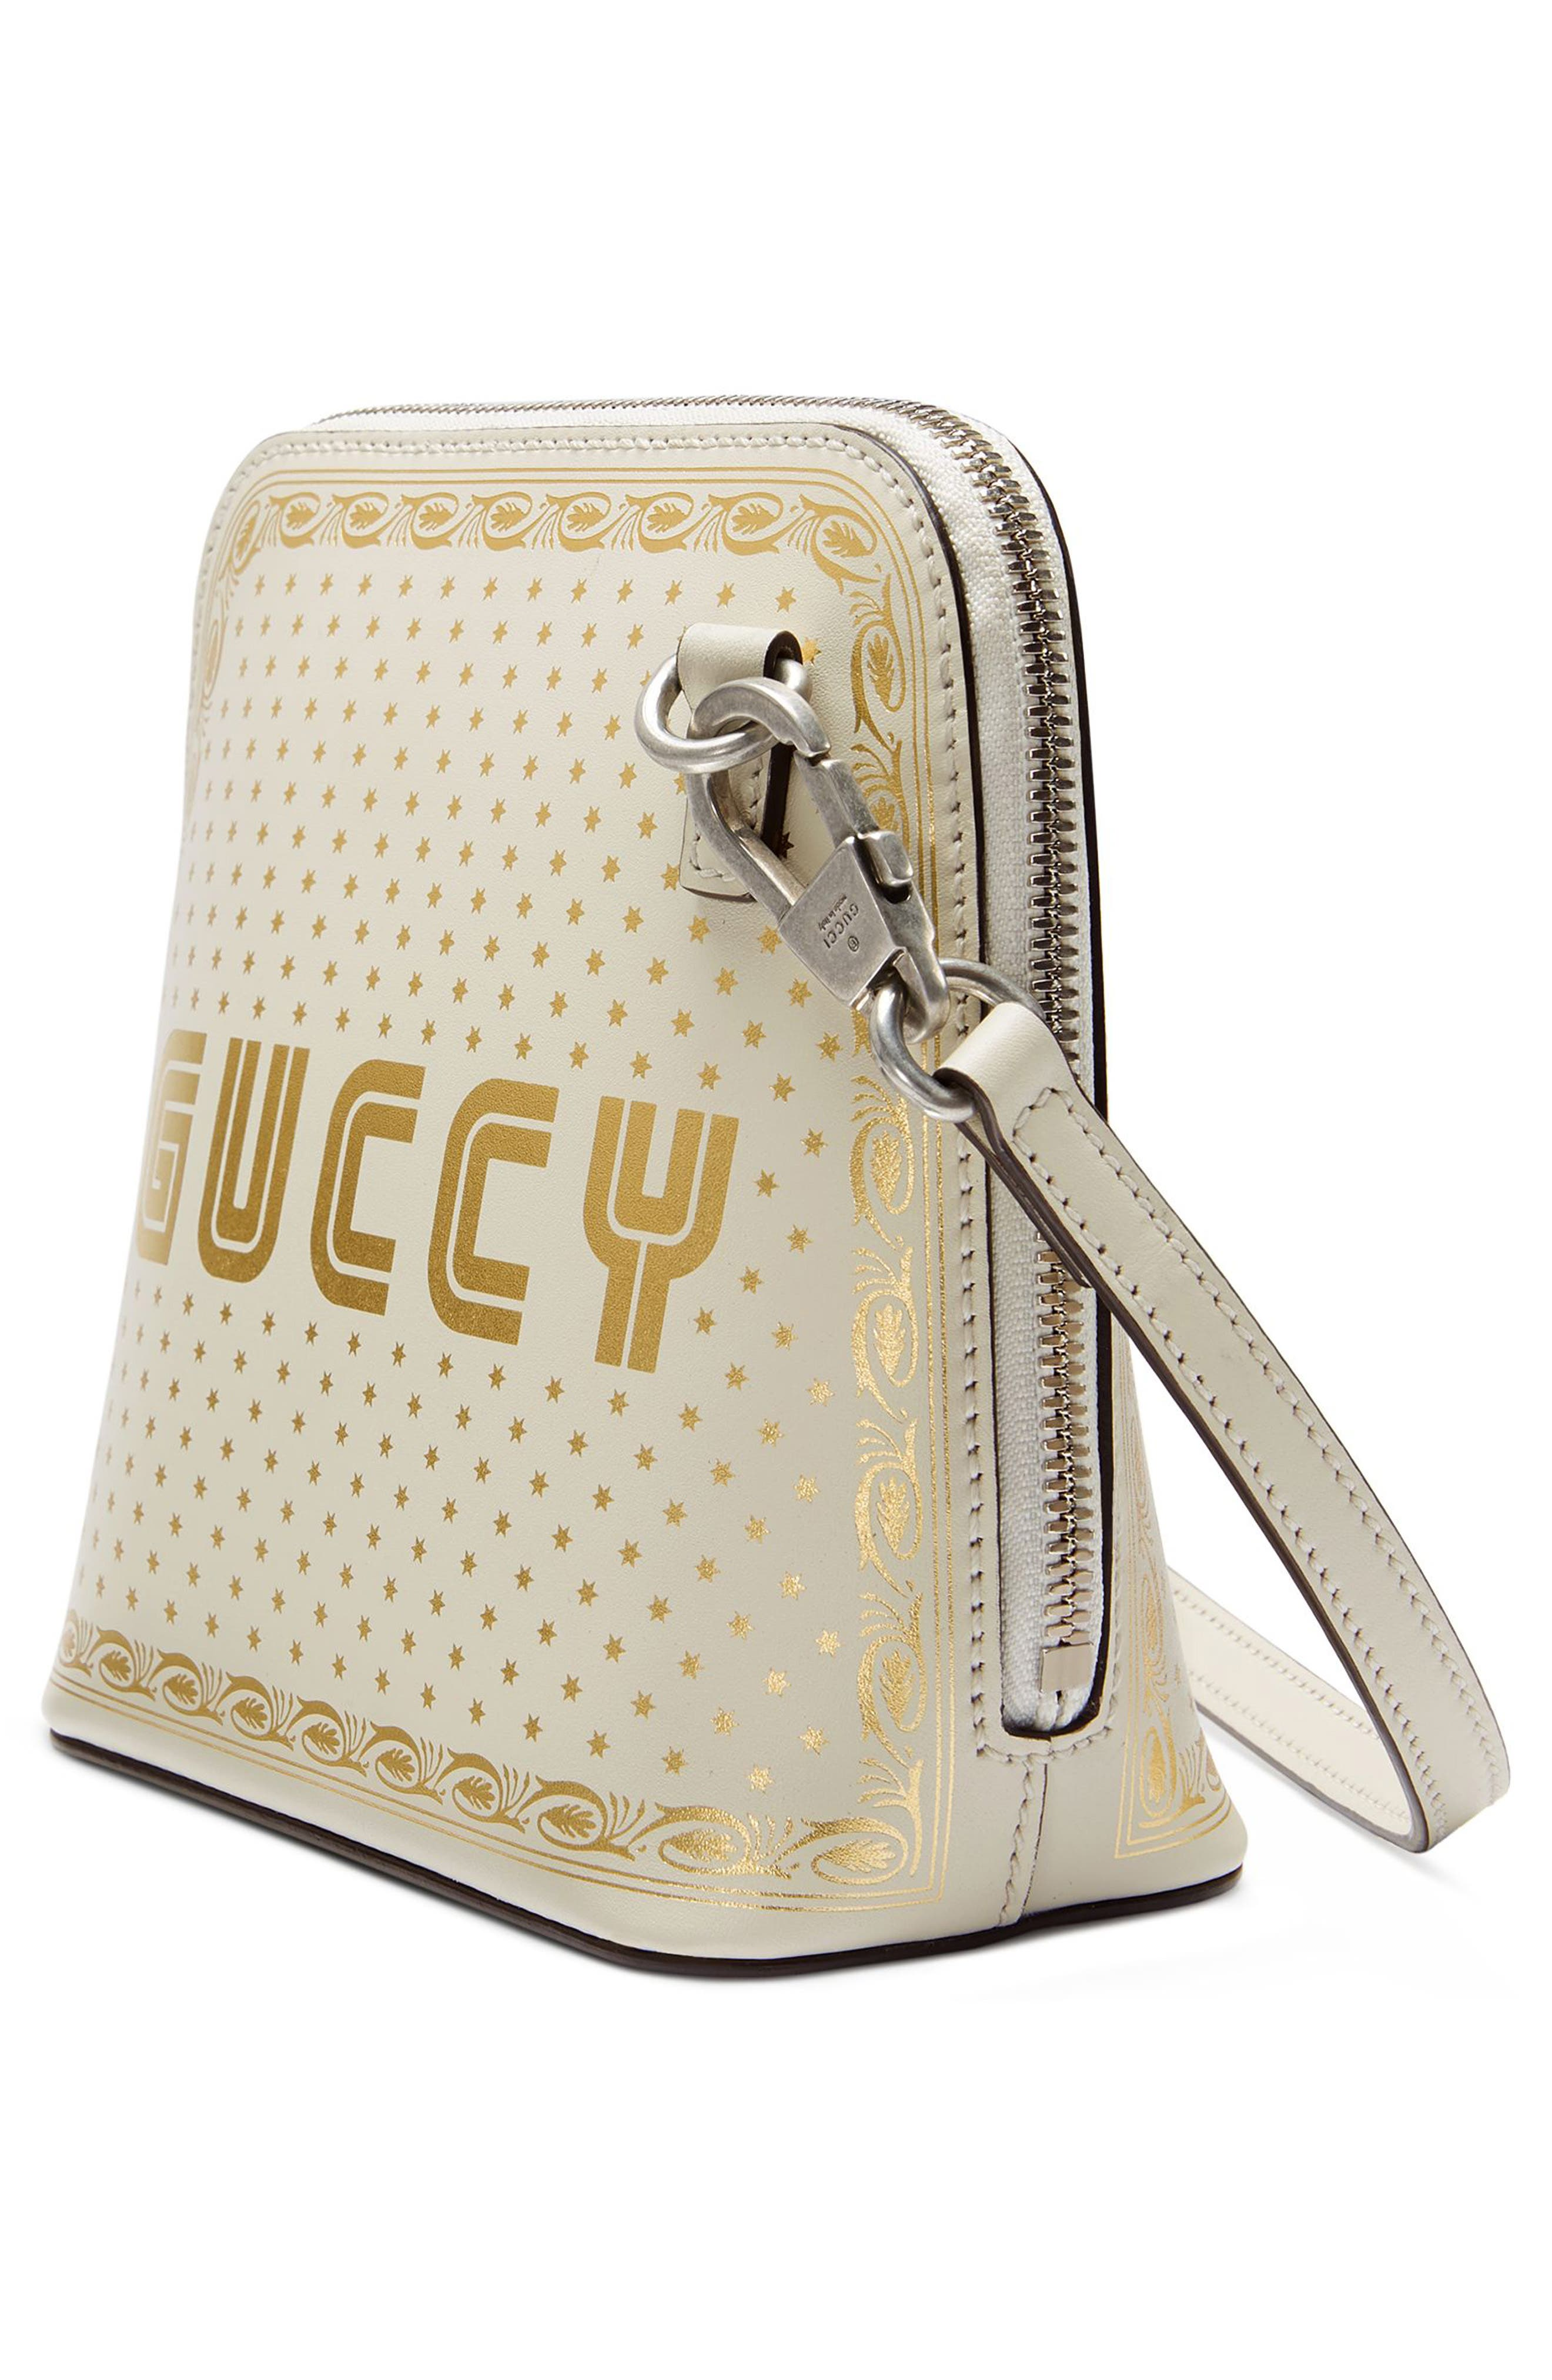 Alternate Image 3  - Gucci Guccy Logo Moon & Stars Leather Crossbody Bag